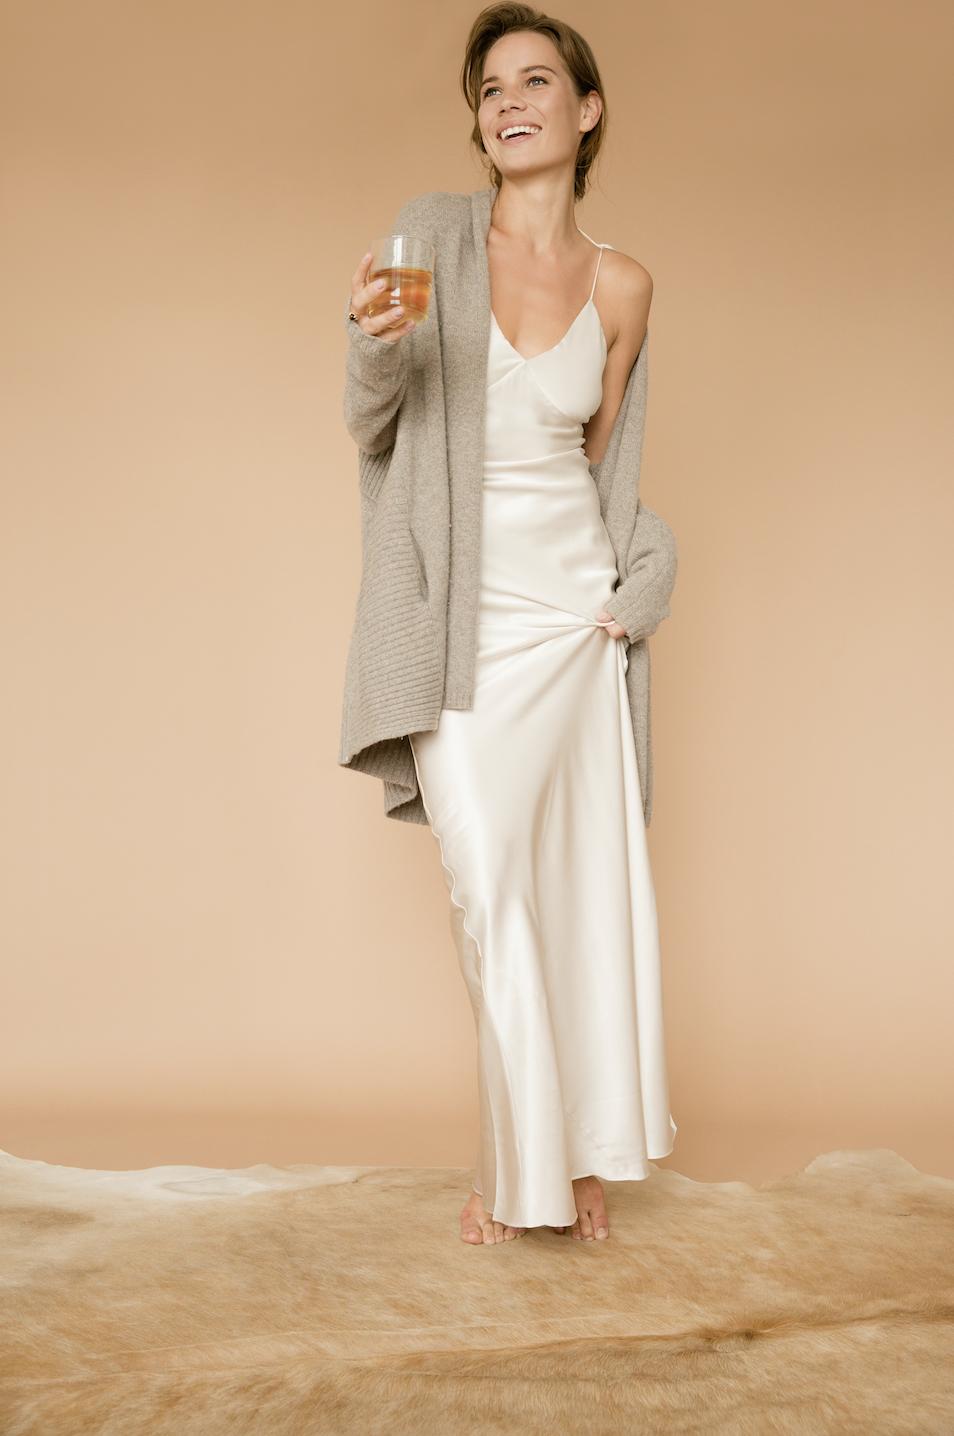 Silk Slip Silk Dress Layering White Silk Dress Elegant Silk Dress Elegant Slip Dress Slip Dress Ou Slip Dress Outfit Elegant Silk Dresses Silk Outfit [ 1436 x 954 Pixel ]